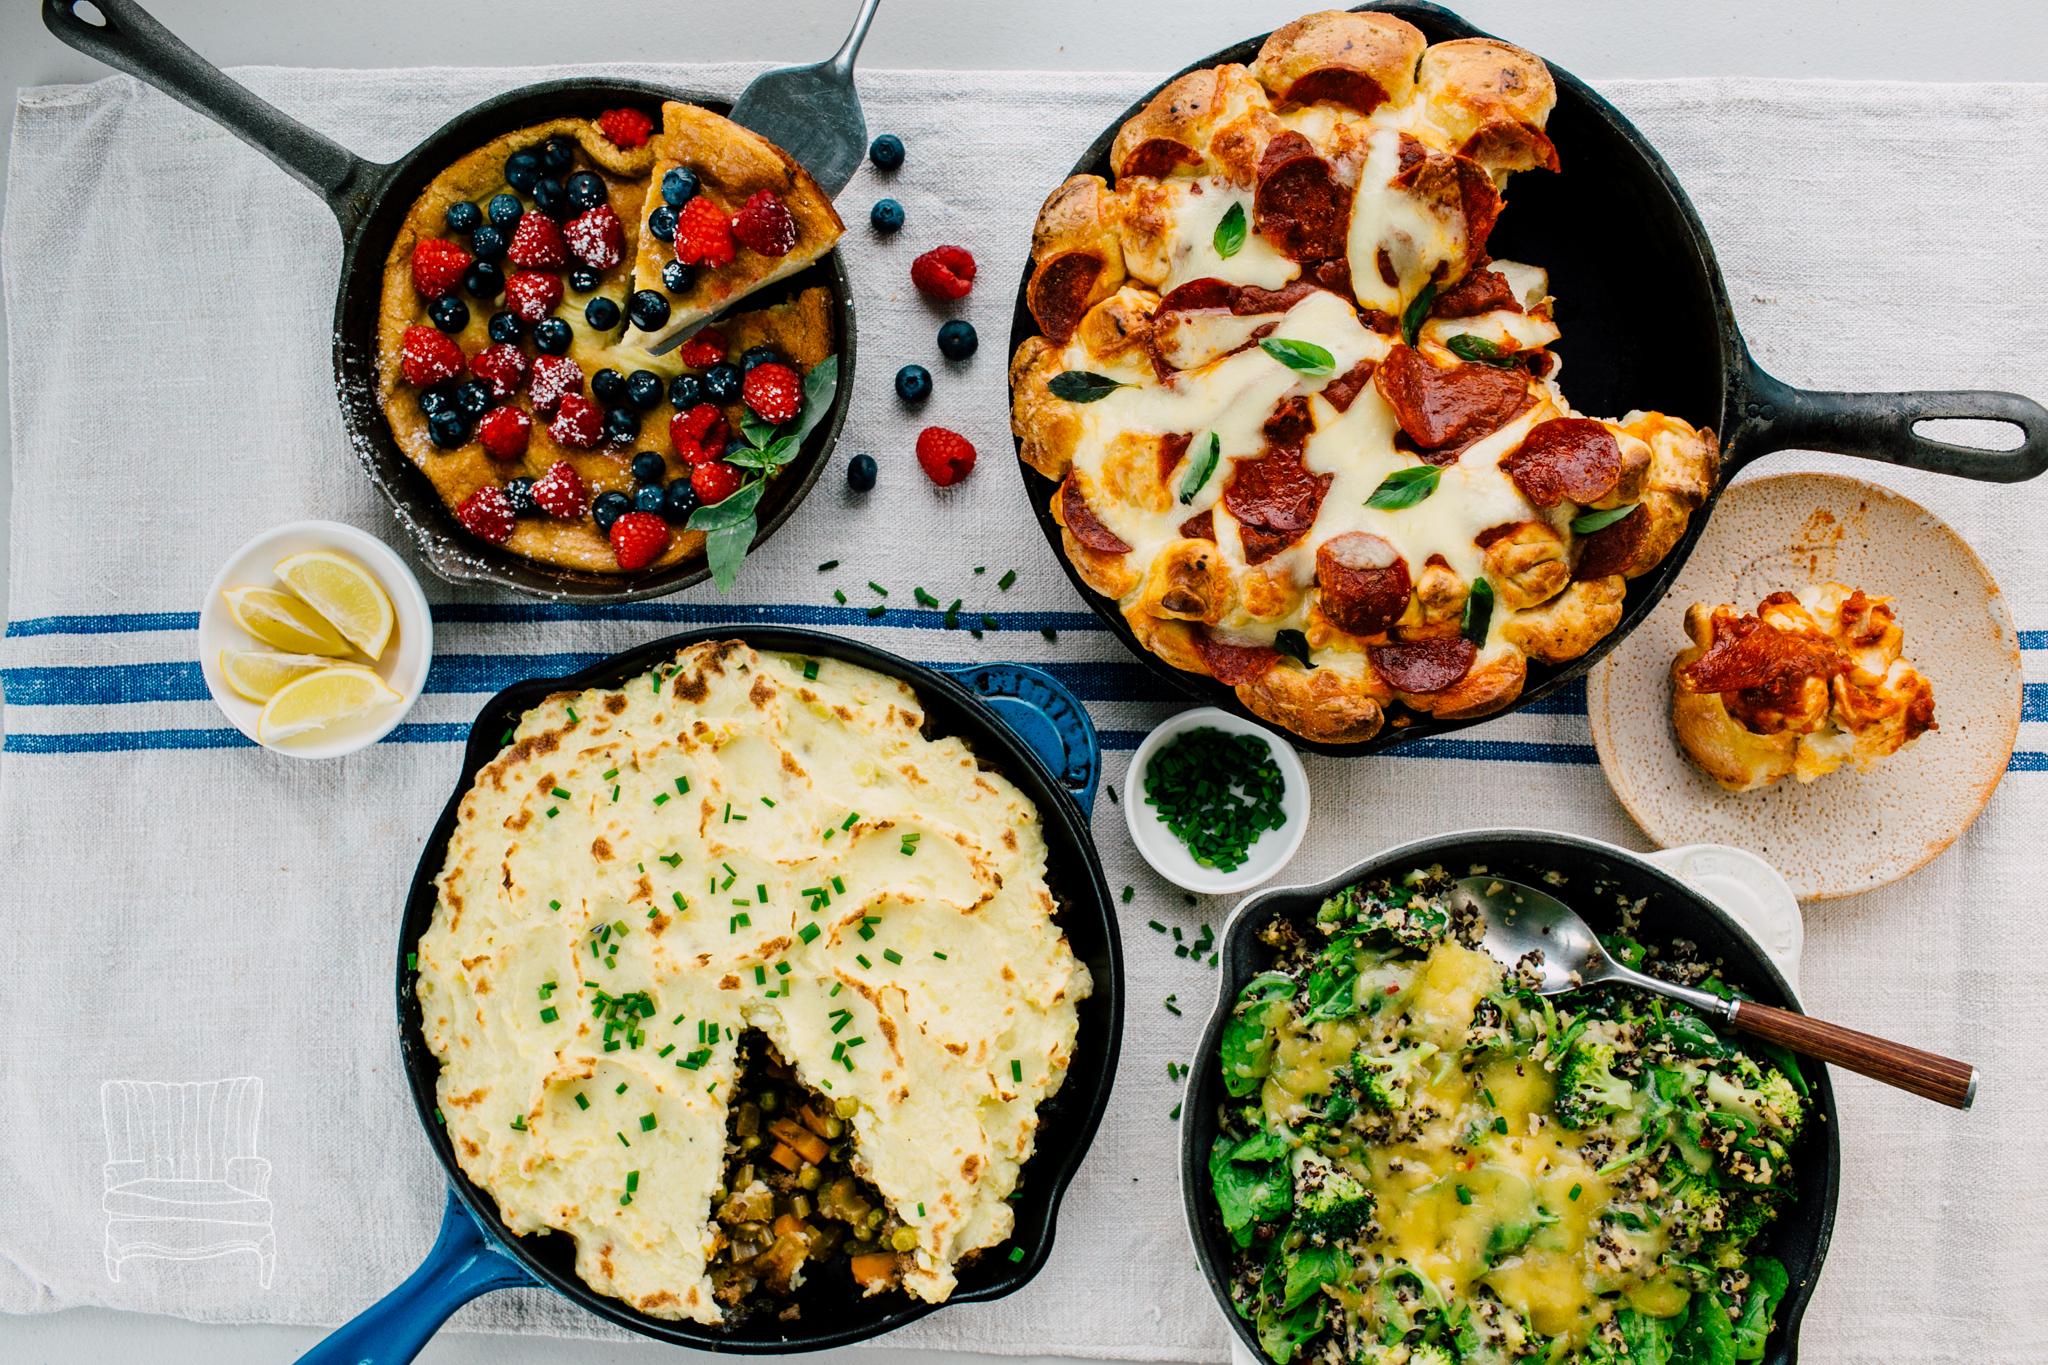 Seattle Food Photographer Katheryn Moran